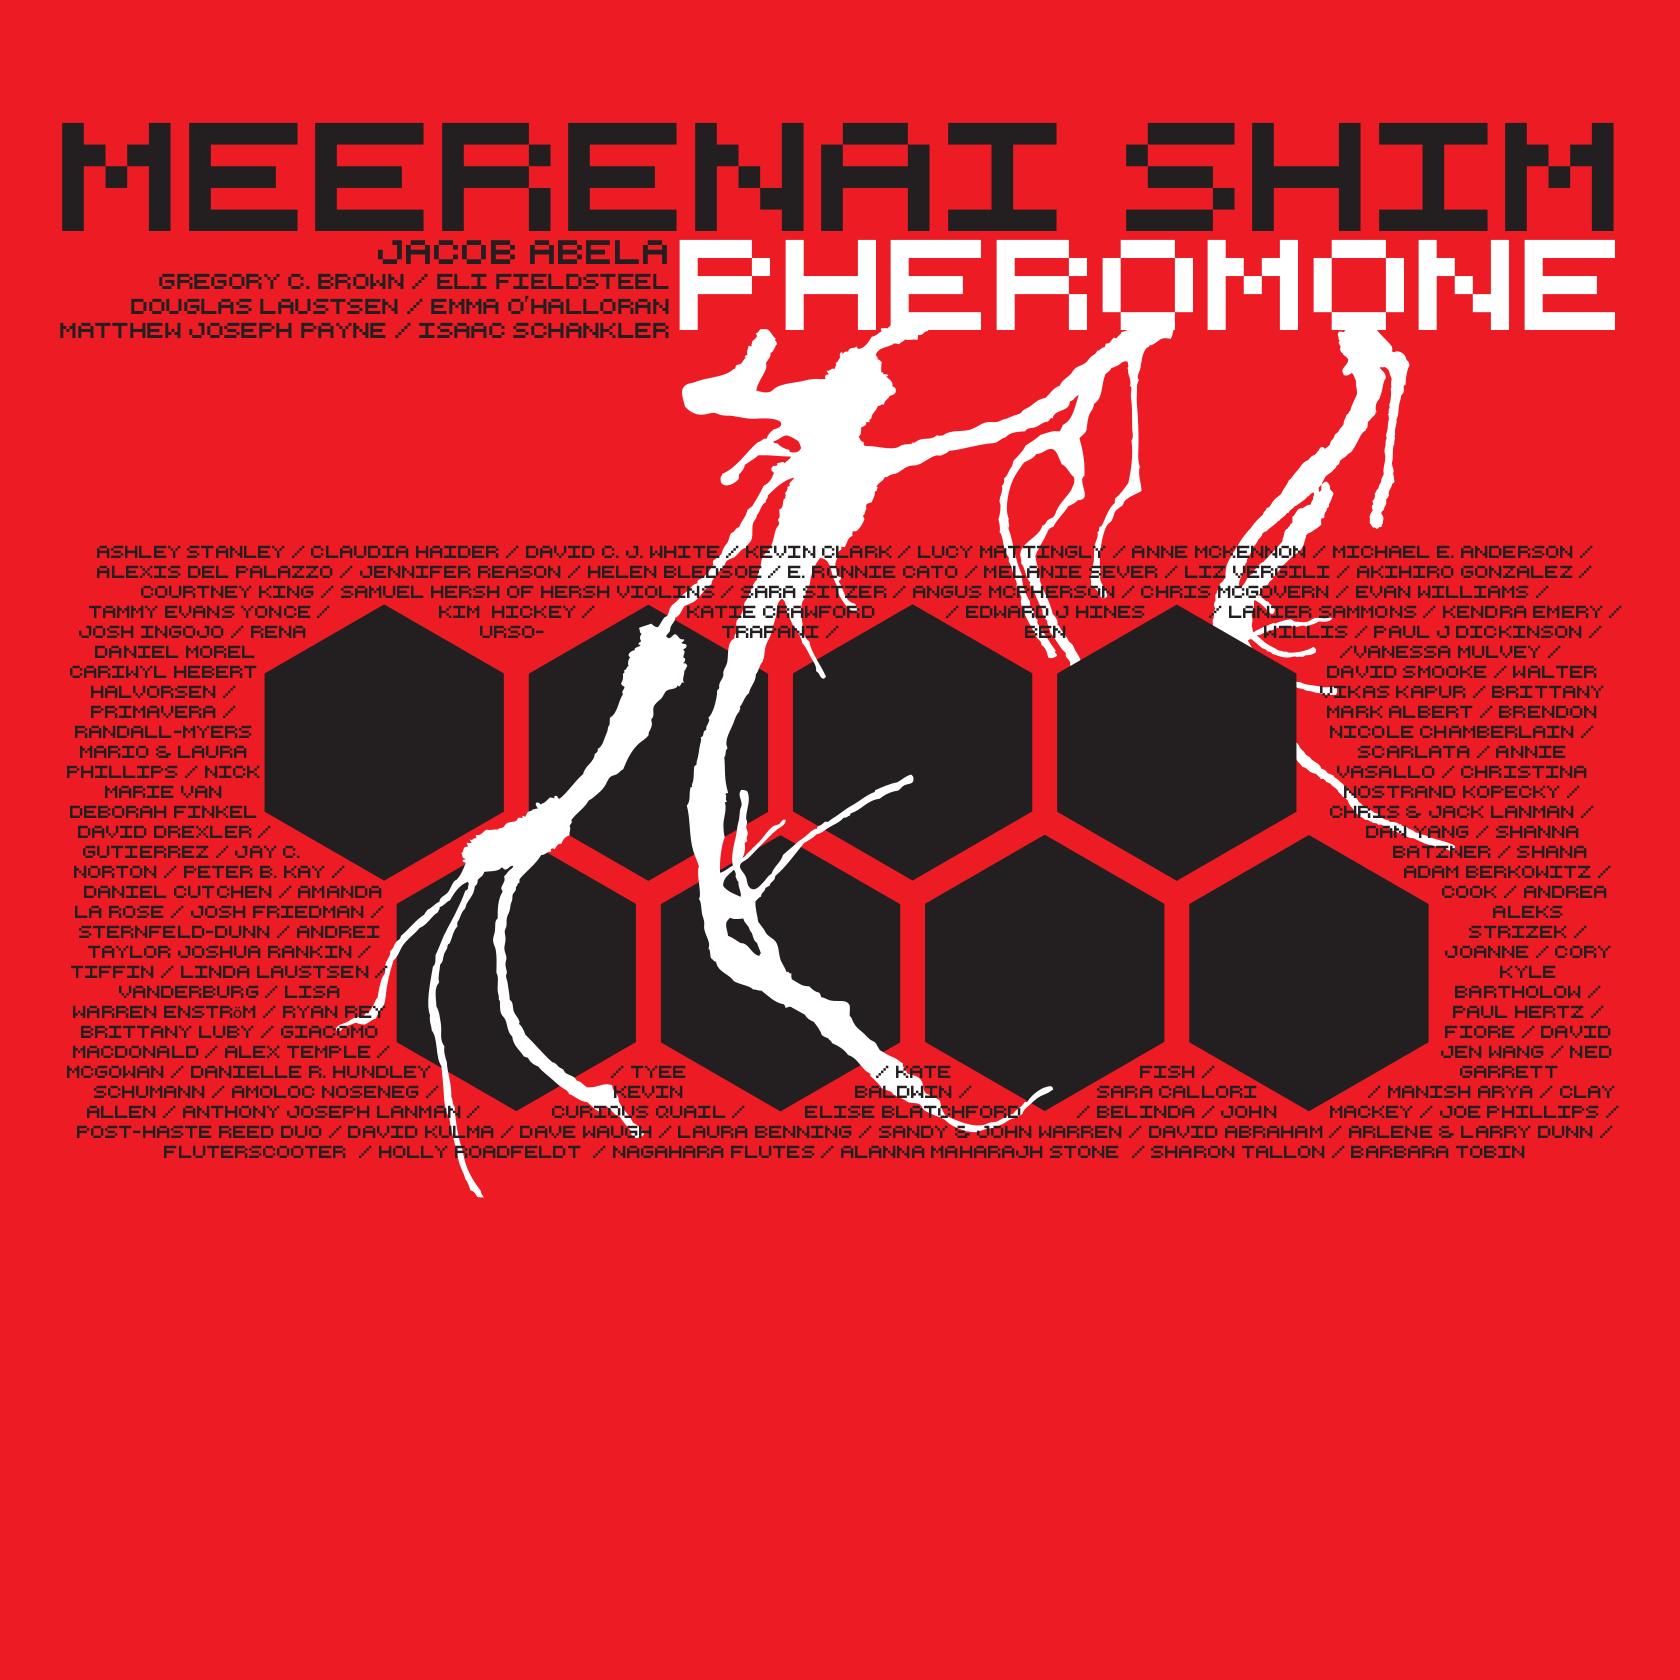 Pheronome-1680x1680-300dpi-1.png